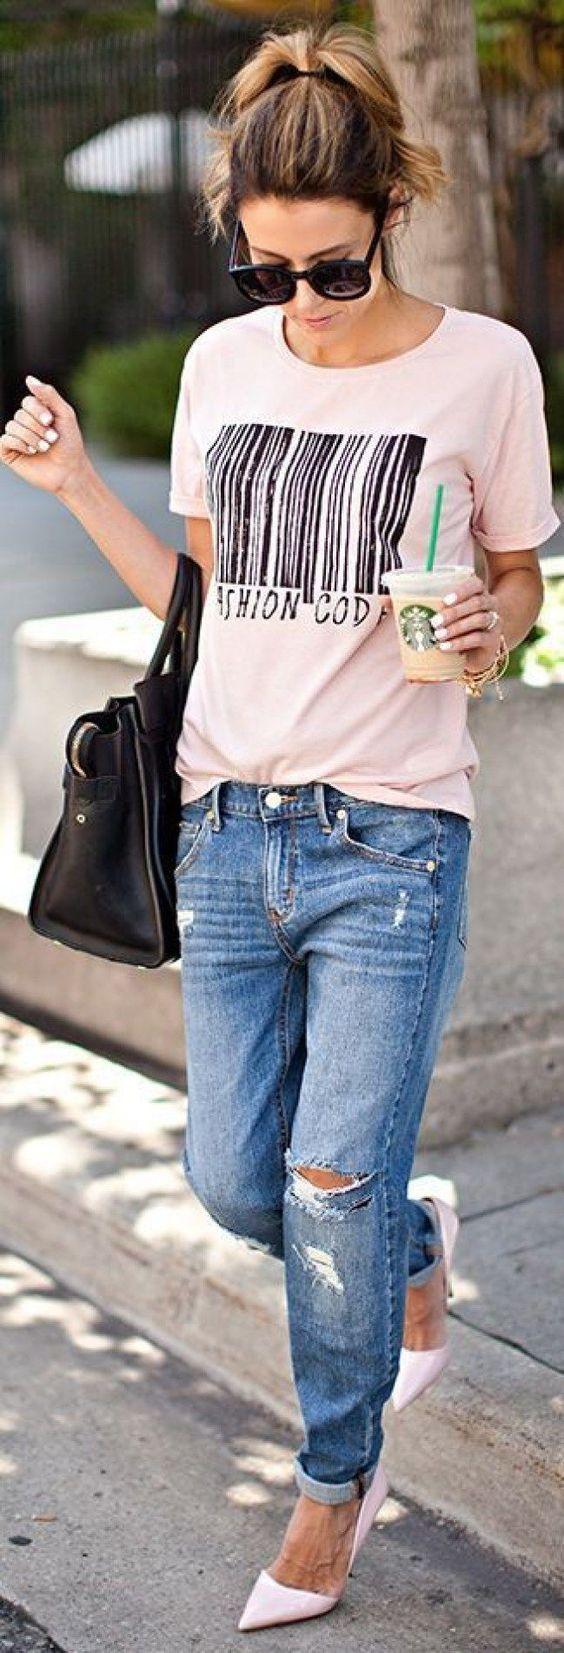 boyfriend jeans kombinieren looks f r jede figur stiche. Black Bedroom Furniture Sets. Home Design Ideas